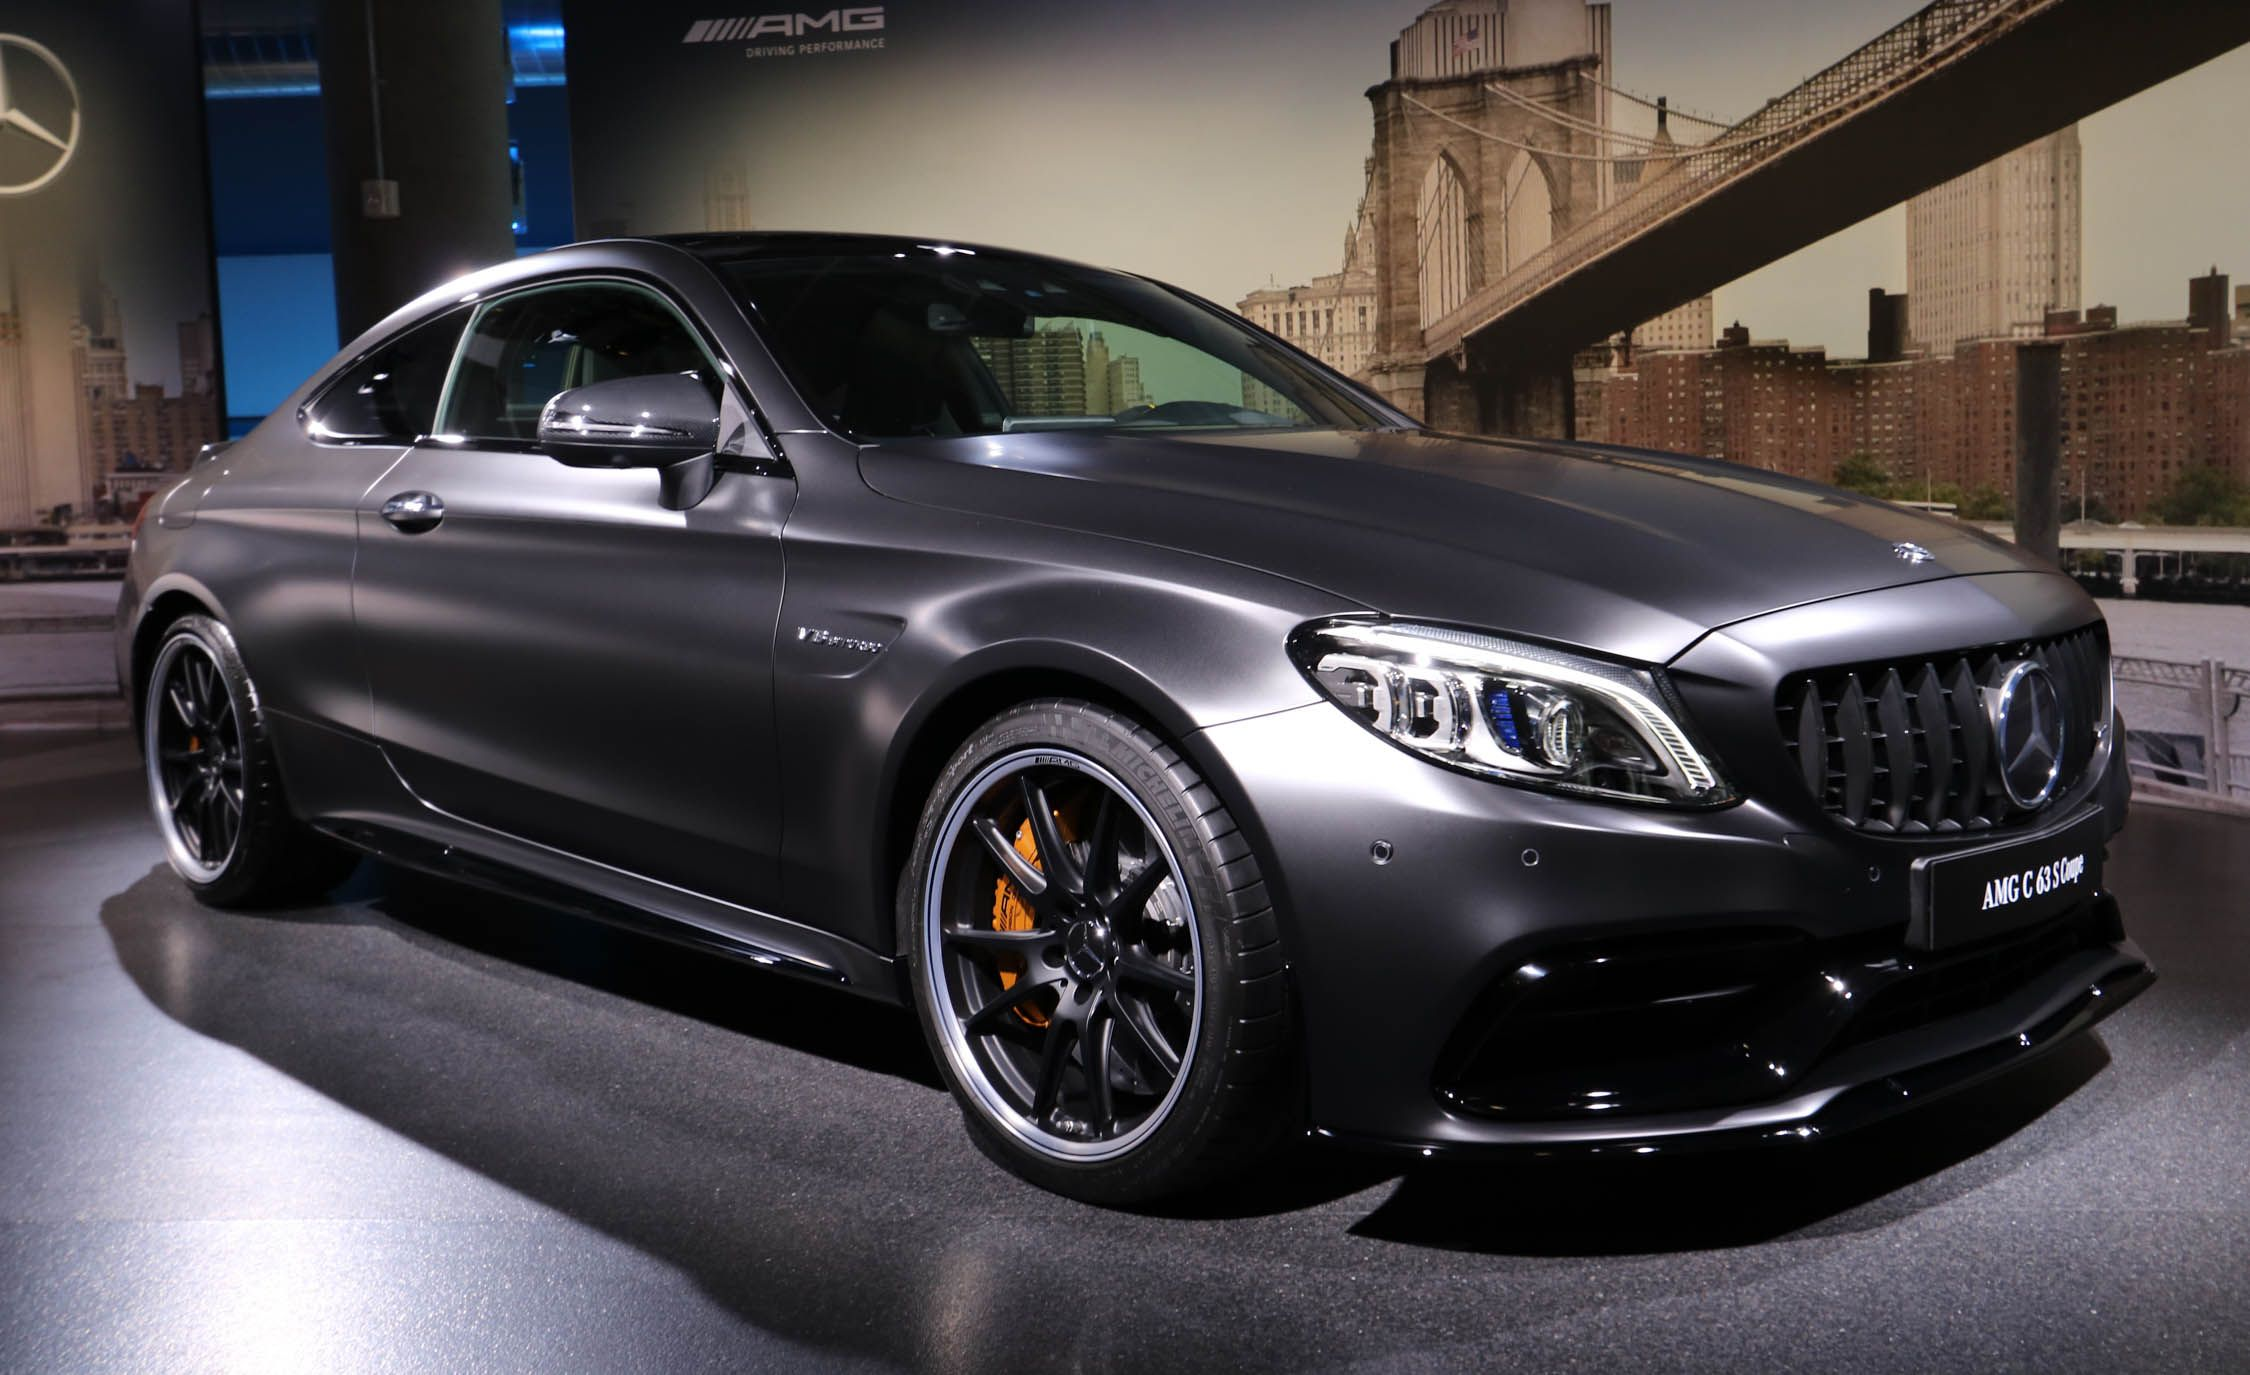 Mercedes AMG C63 Reviews